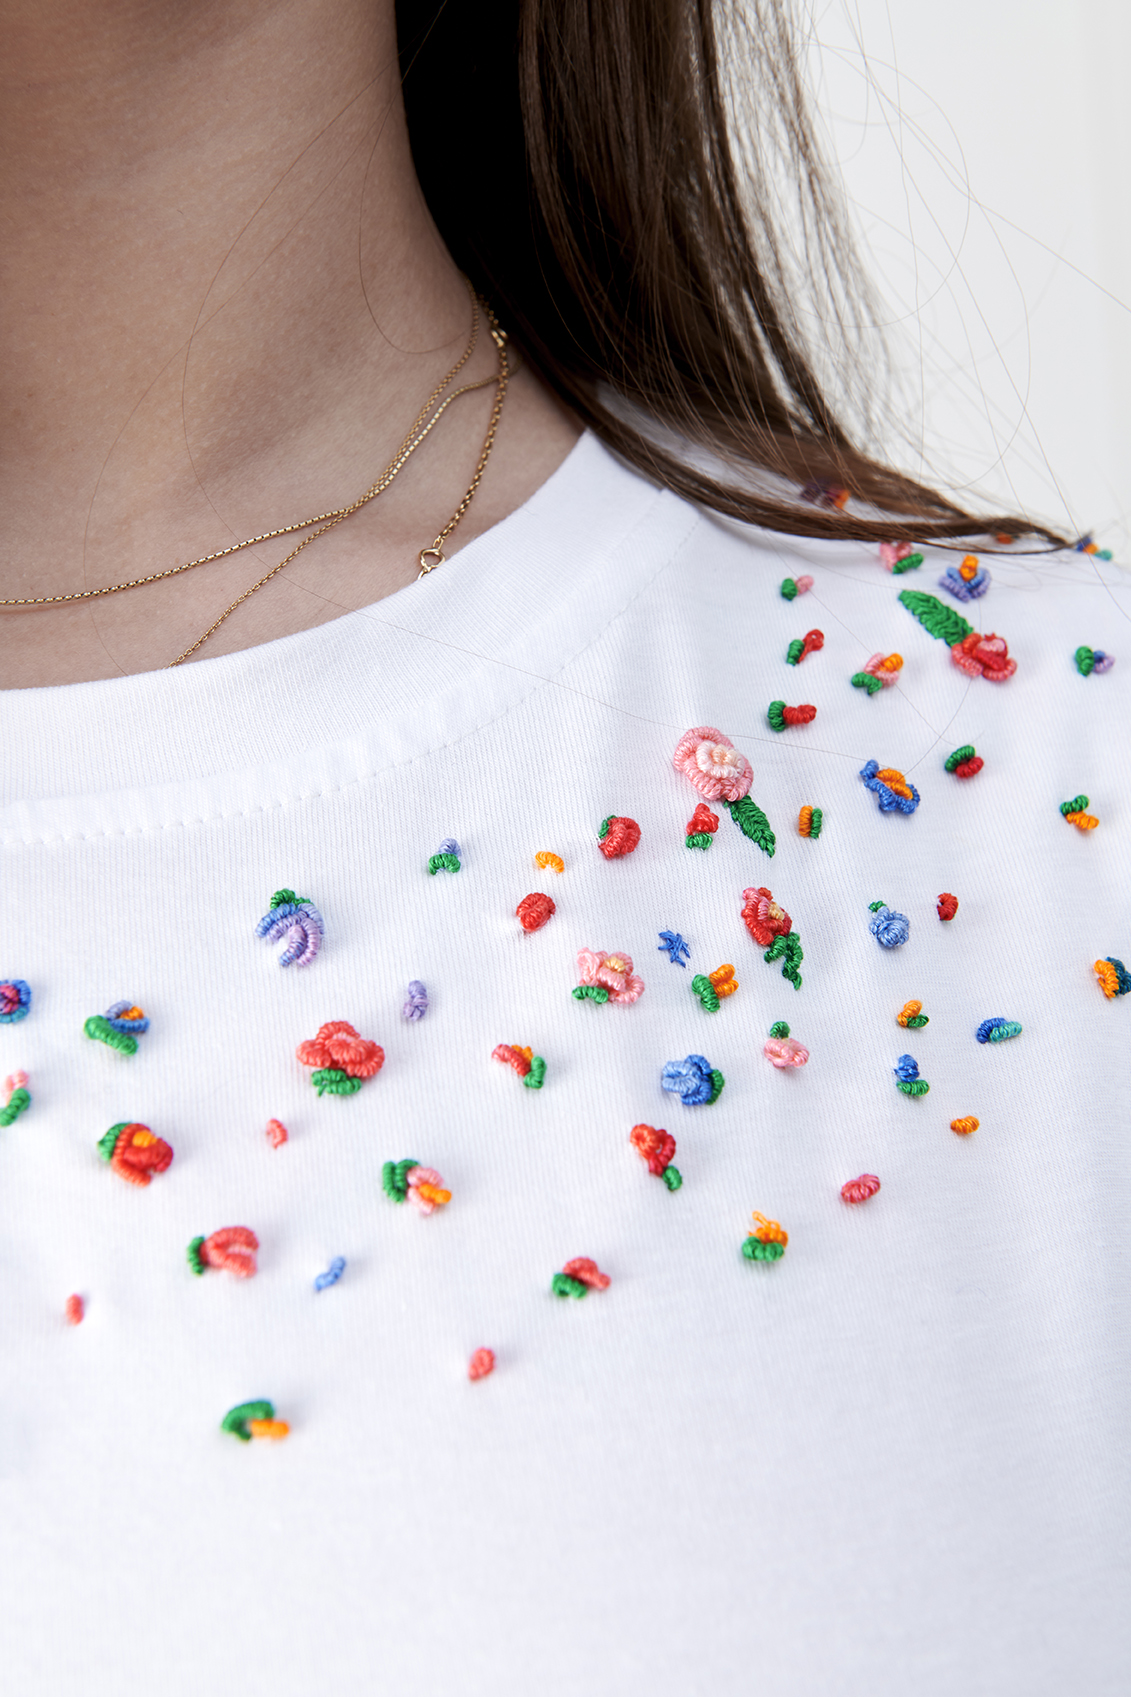 MATEO PICARD  Atelier Nucci – Womenswear Lookbook